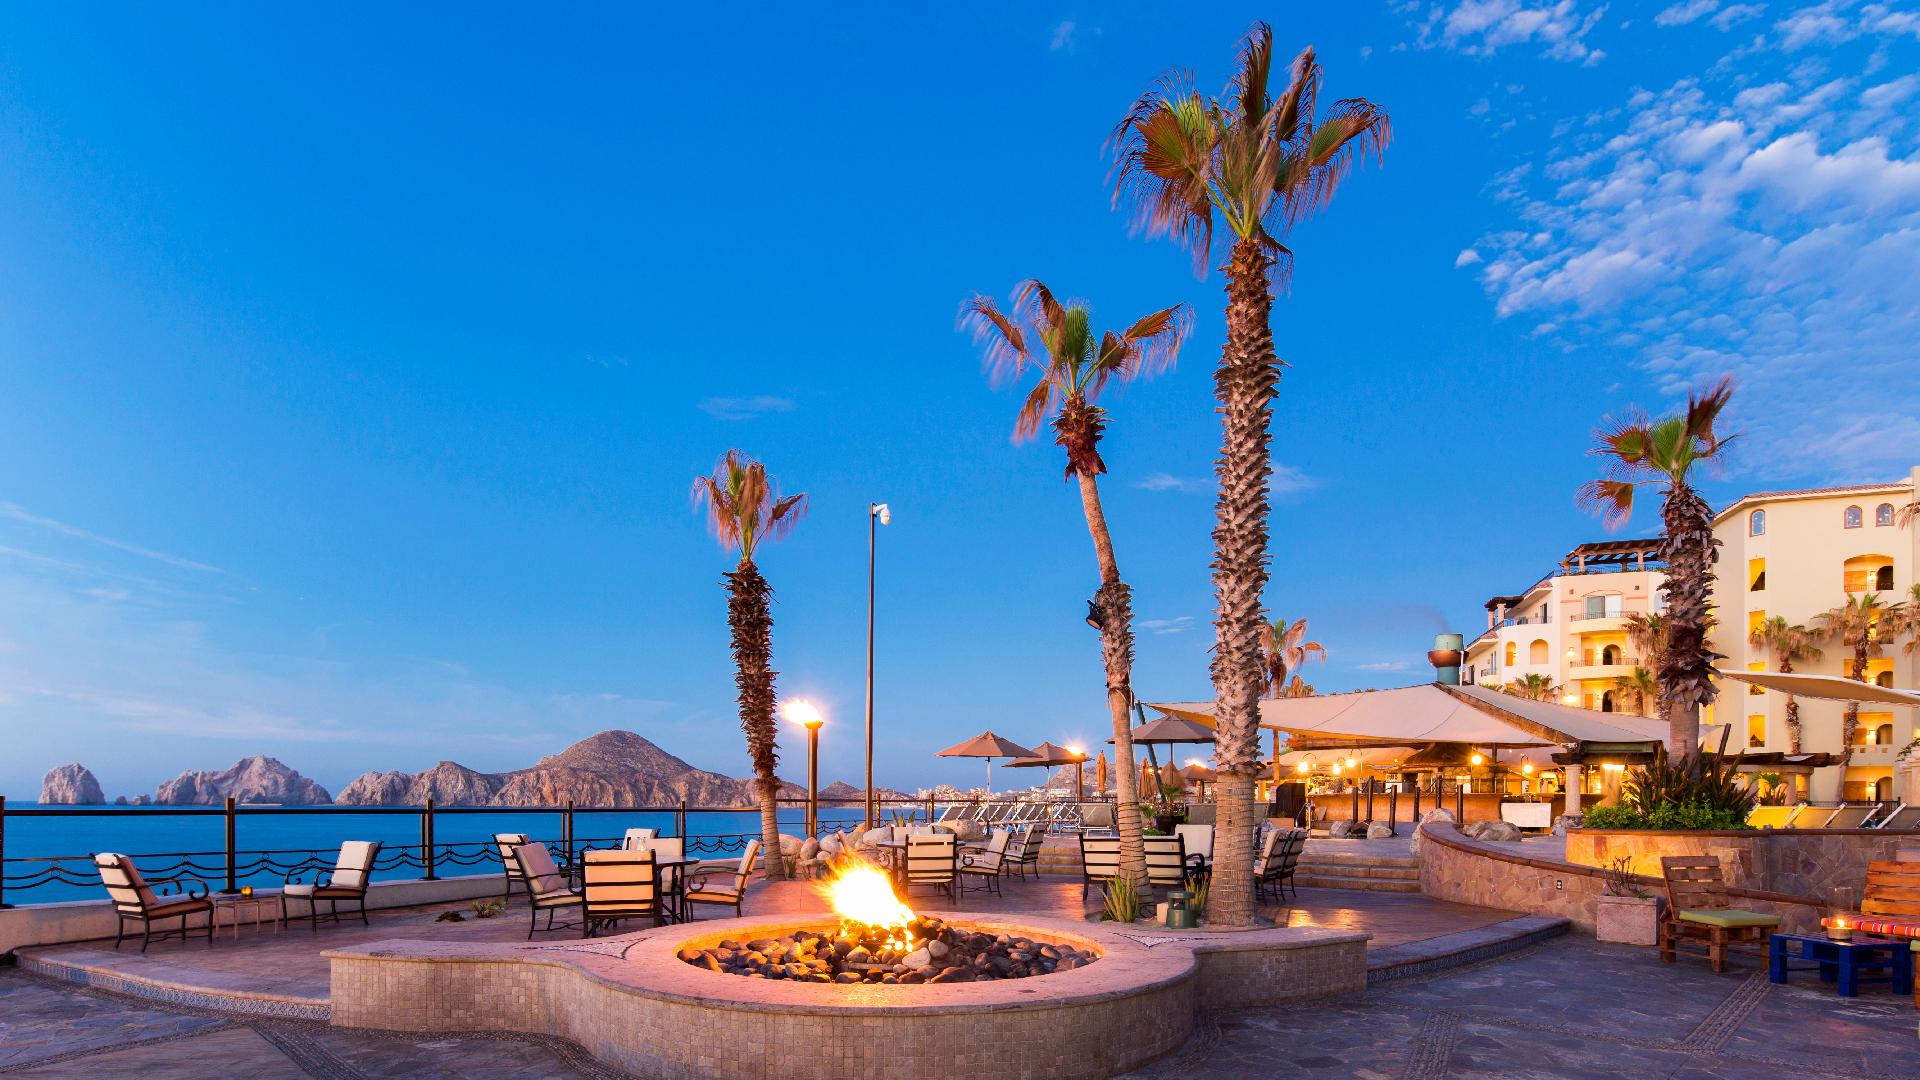 Villa Del Palmar Cabo San Lucas Desert Lounge